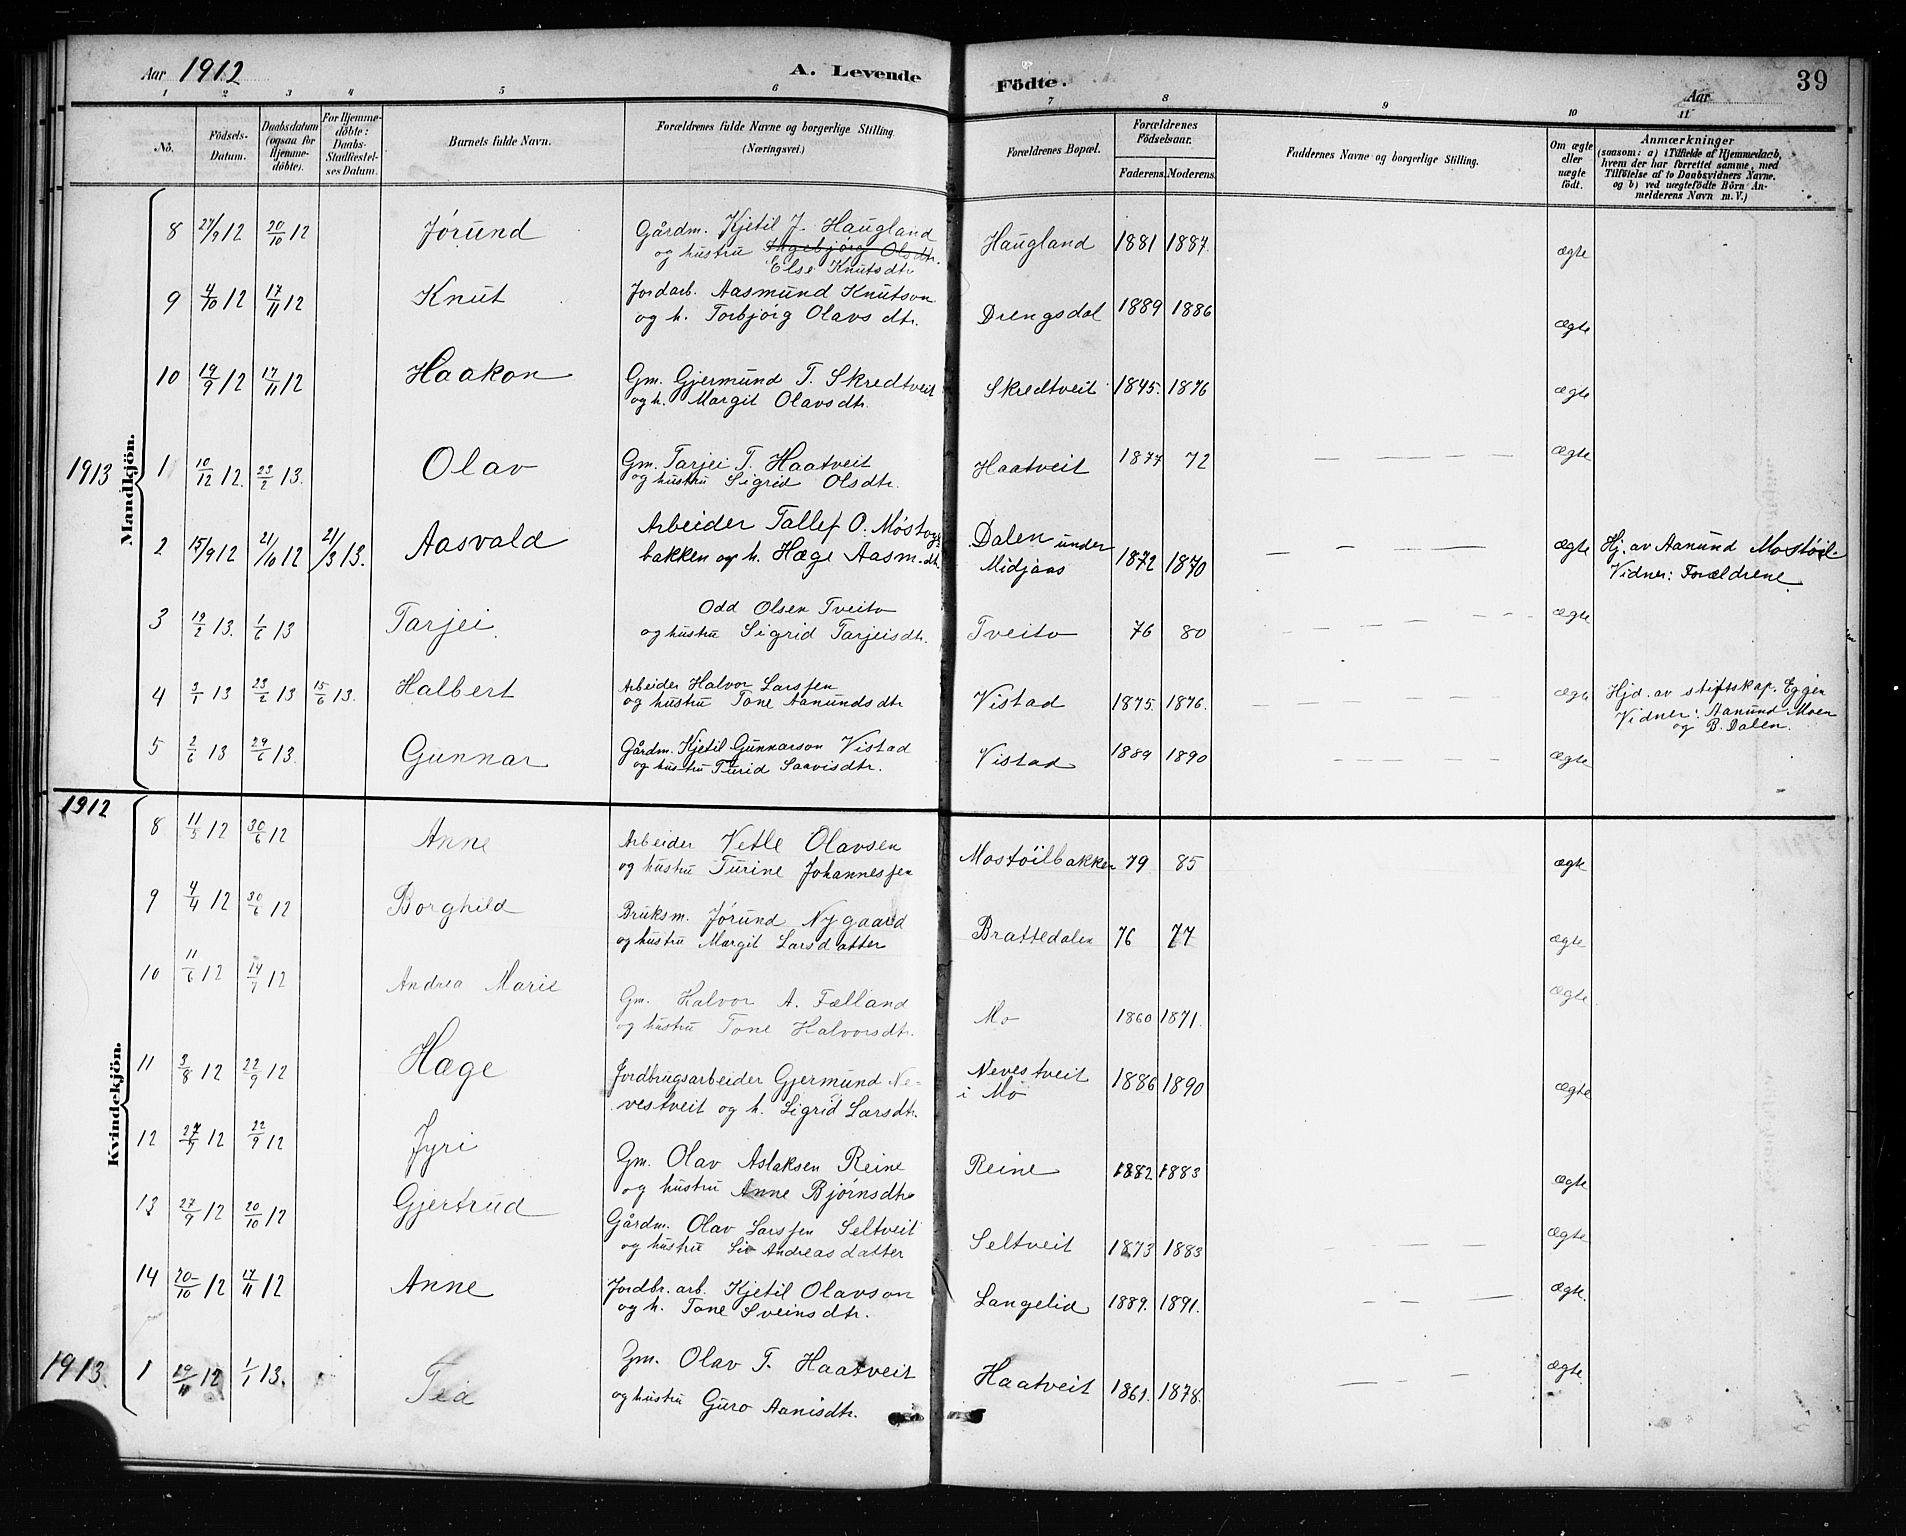 SAKO, Mo kirkebøker, G/Ga/L0002: Klokkerbok nr. I 2, 1892-1914, s. 39